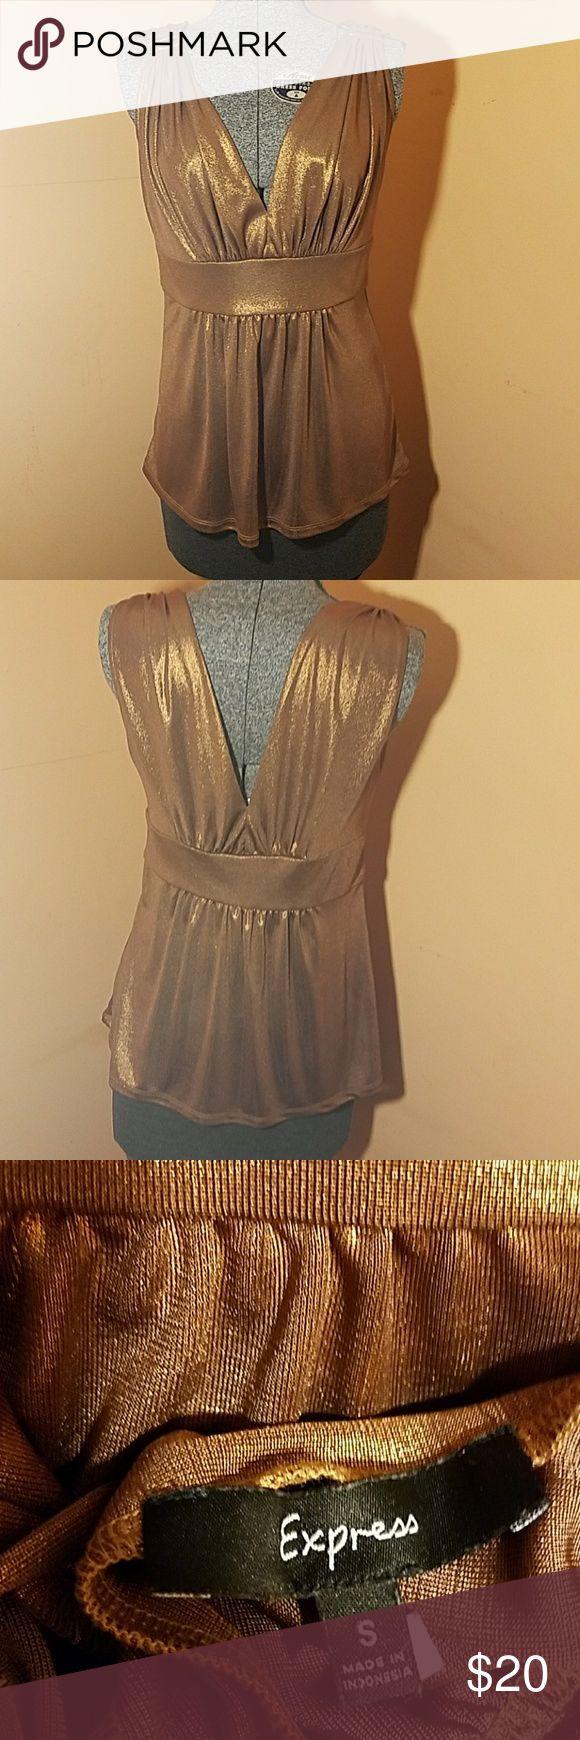 Selling this Plunge bronze metallic blouse on Poshmark! My username is: erdelizabeth. #shopmycloset #poshmark #fashion #shopping #style #forsale #Express #Tops